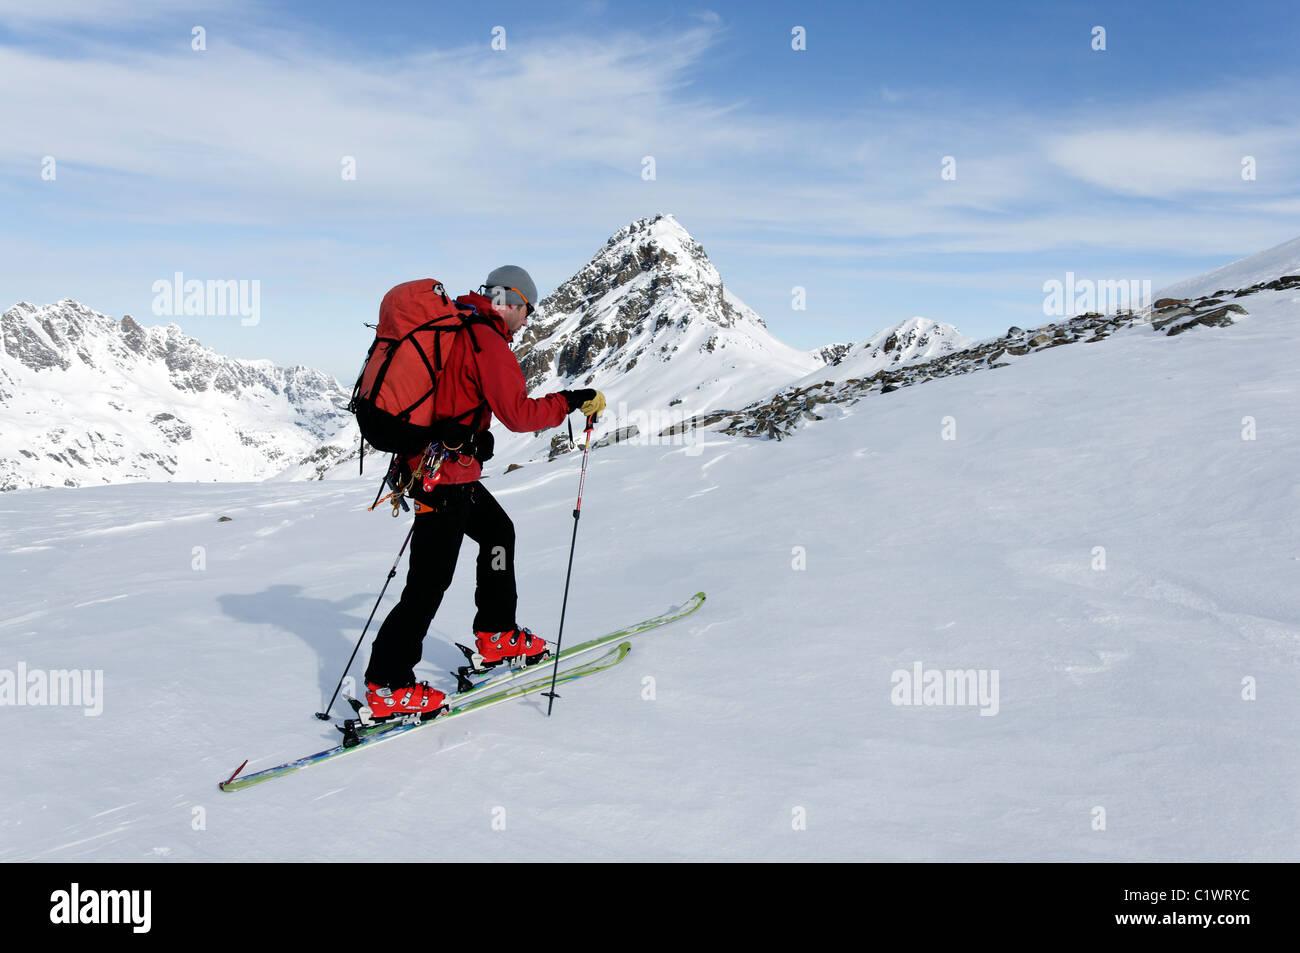 Ski touring in the Silvretta region of Austria Stock Photo